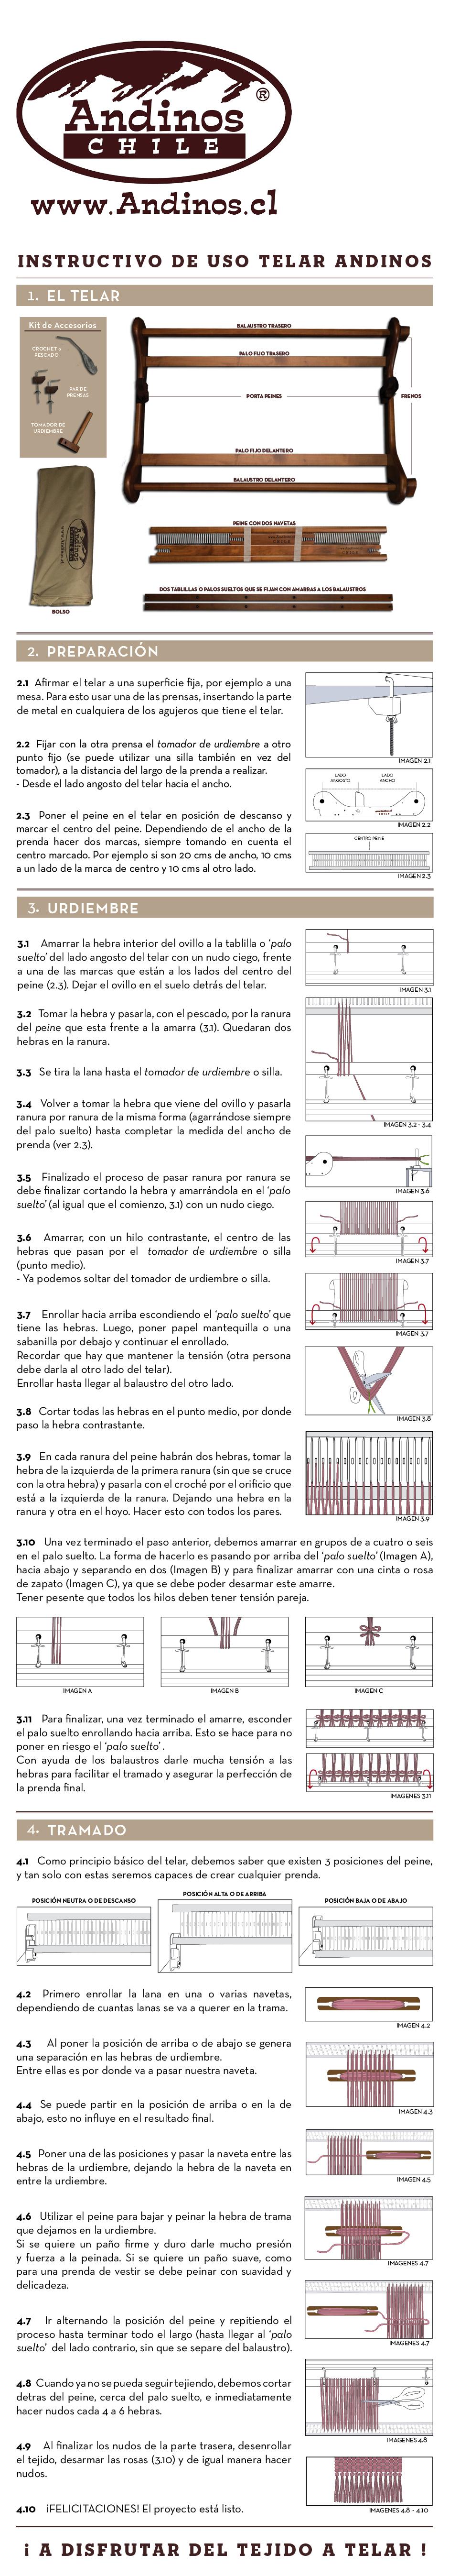 INSTRUCTIVO USO TELAR WEB